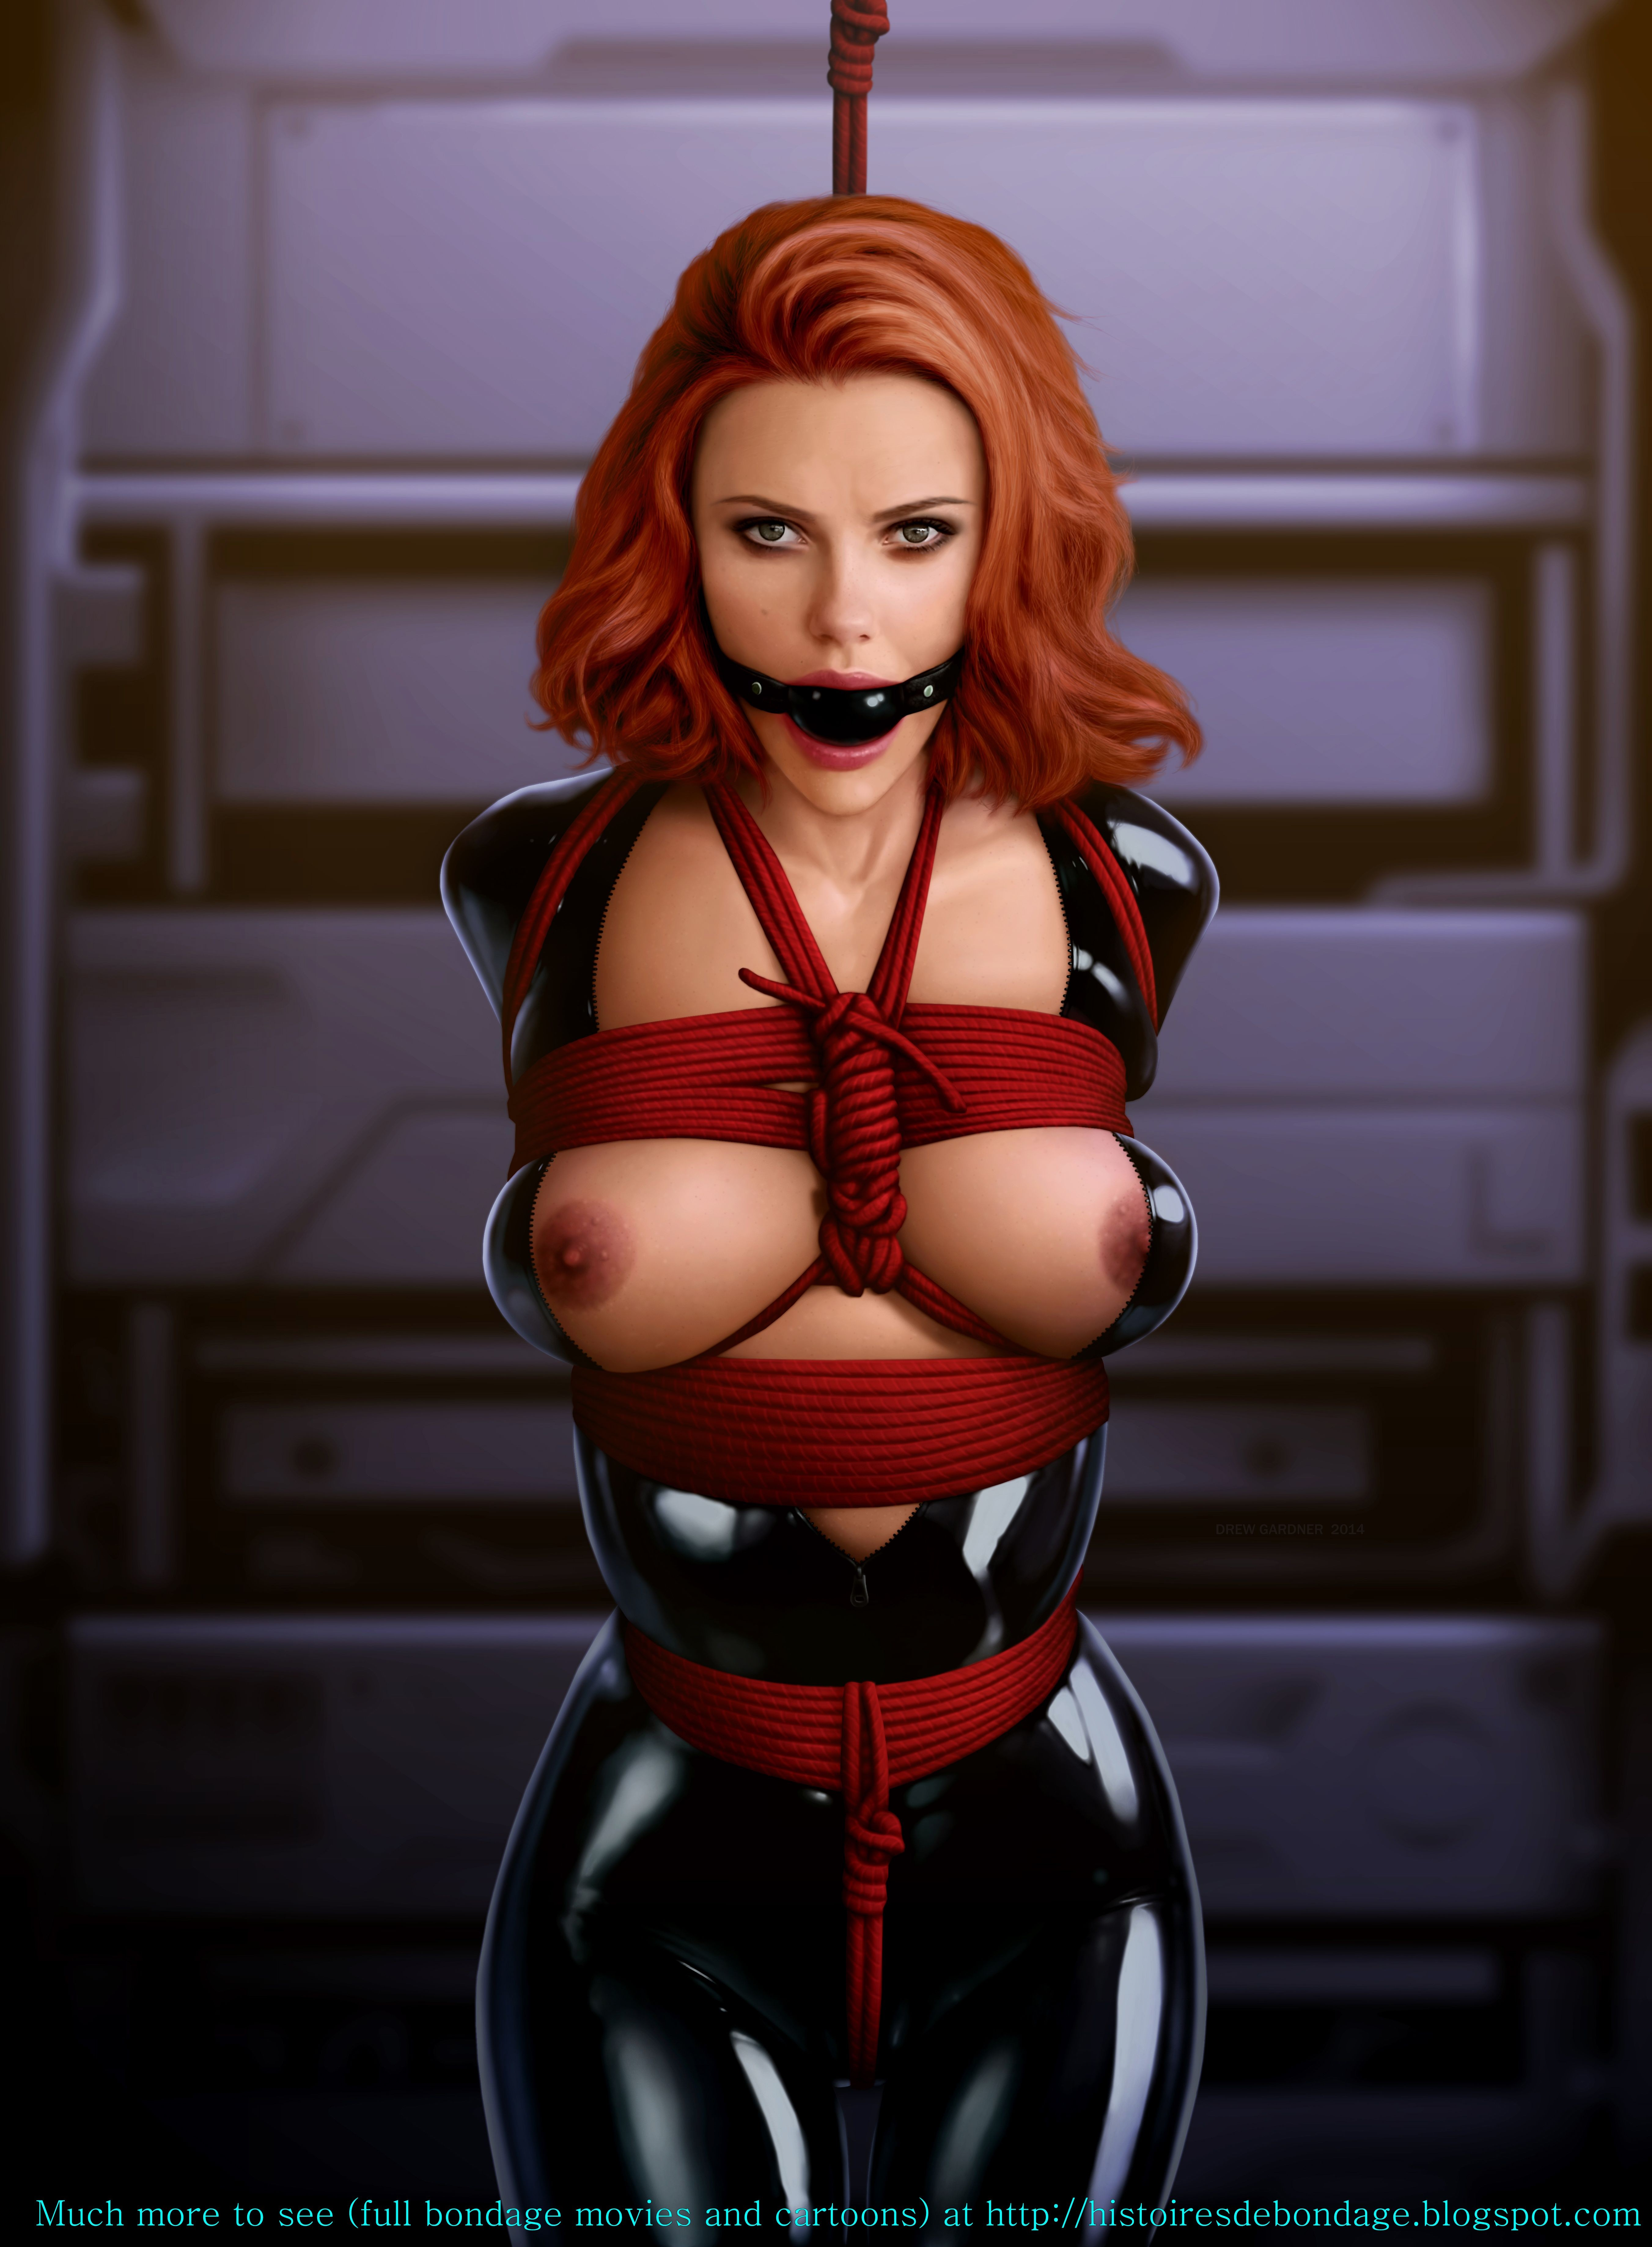 БДСМ фото бондаж фото галереи БДСМ галереи BDSM БДСМ